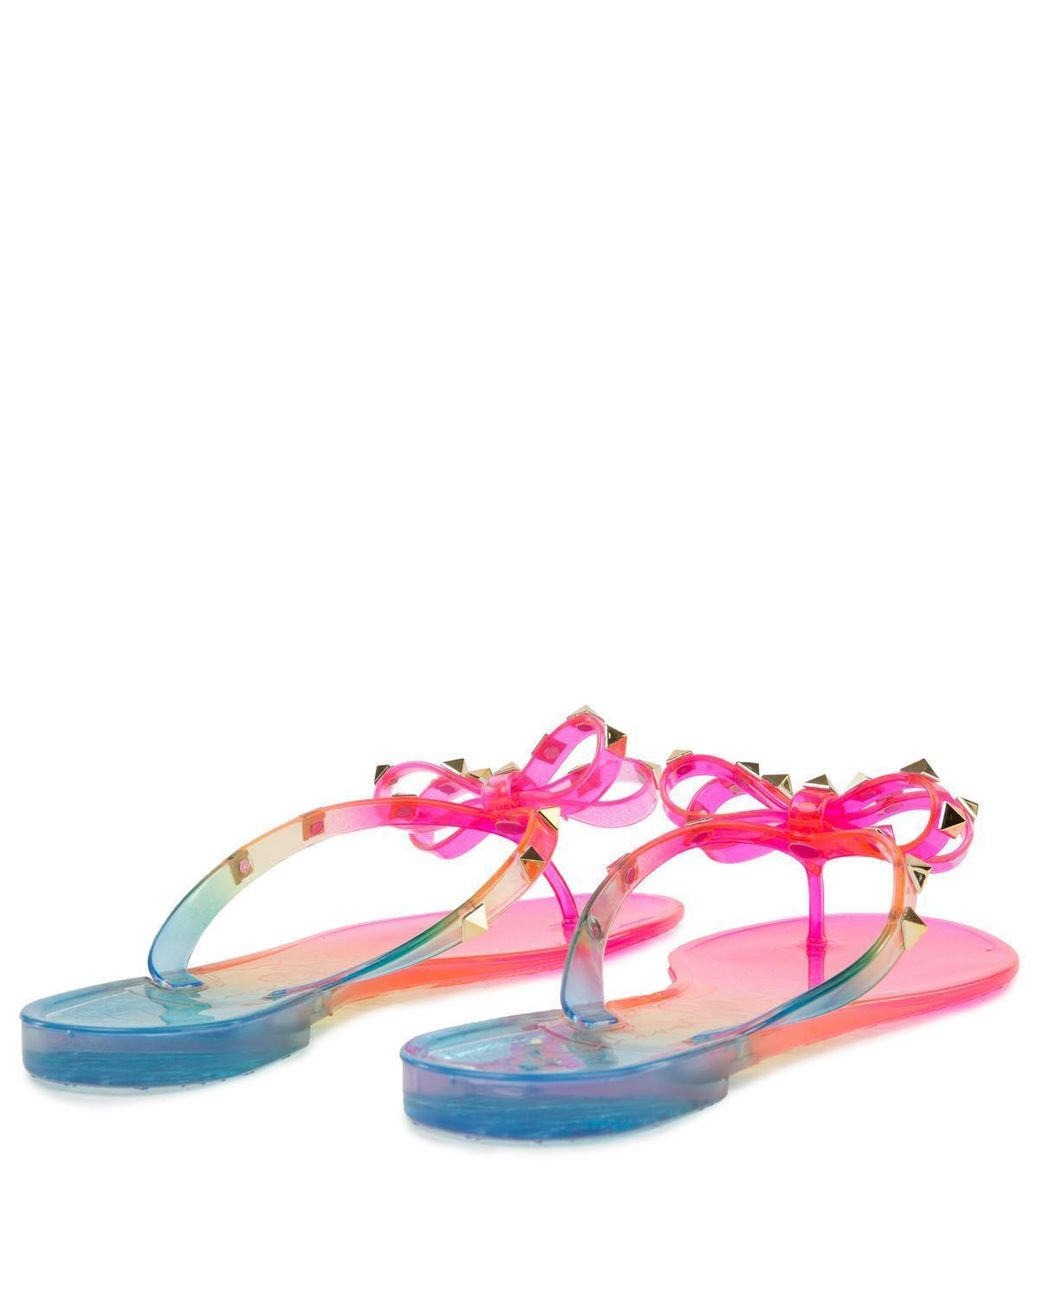 NEW Liliana Jelli-40 Black Studded Bow Jelly PVC Sandal